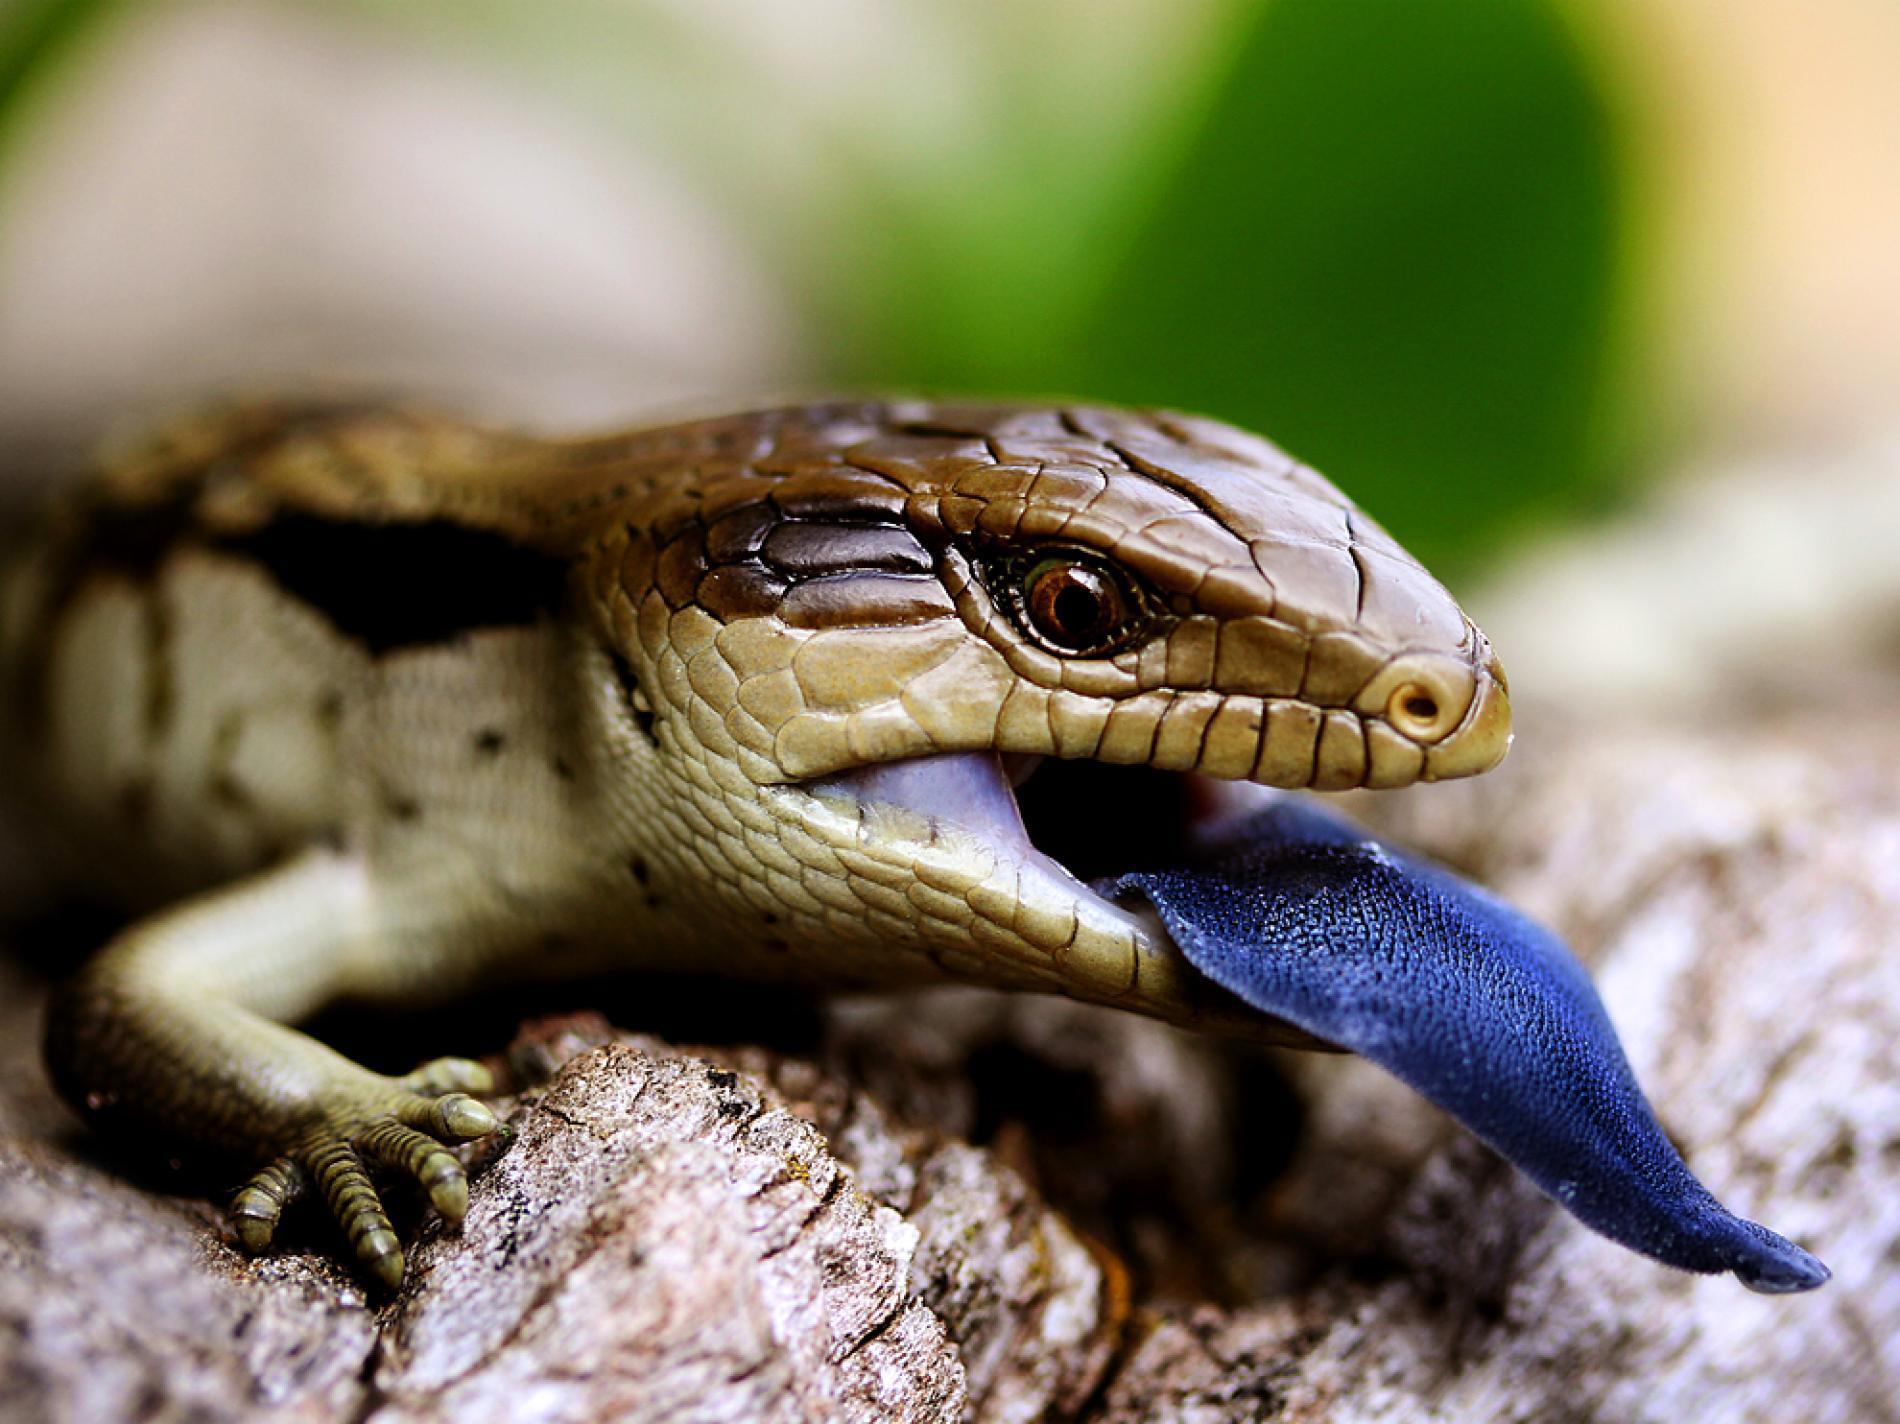 Drawn reptile blue tongue lizard  Lizard Blue Australia Tongue